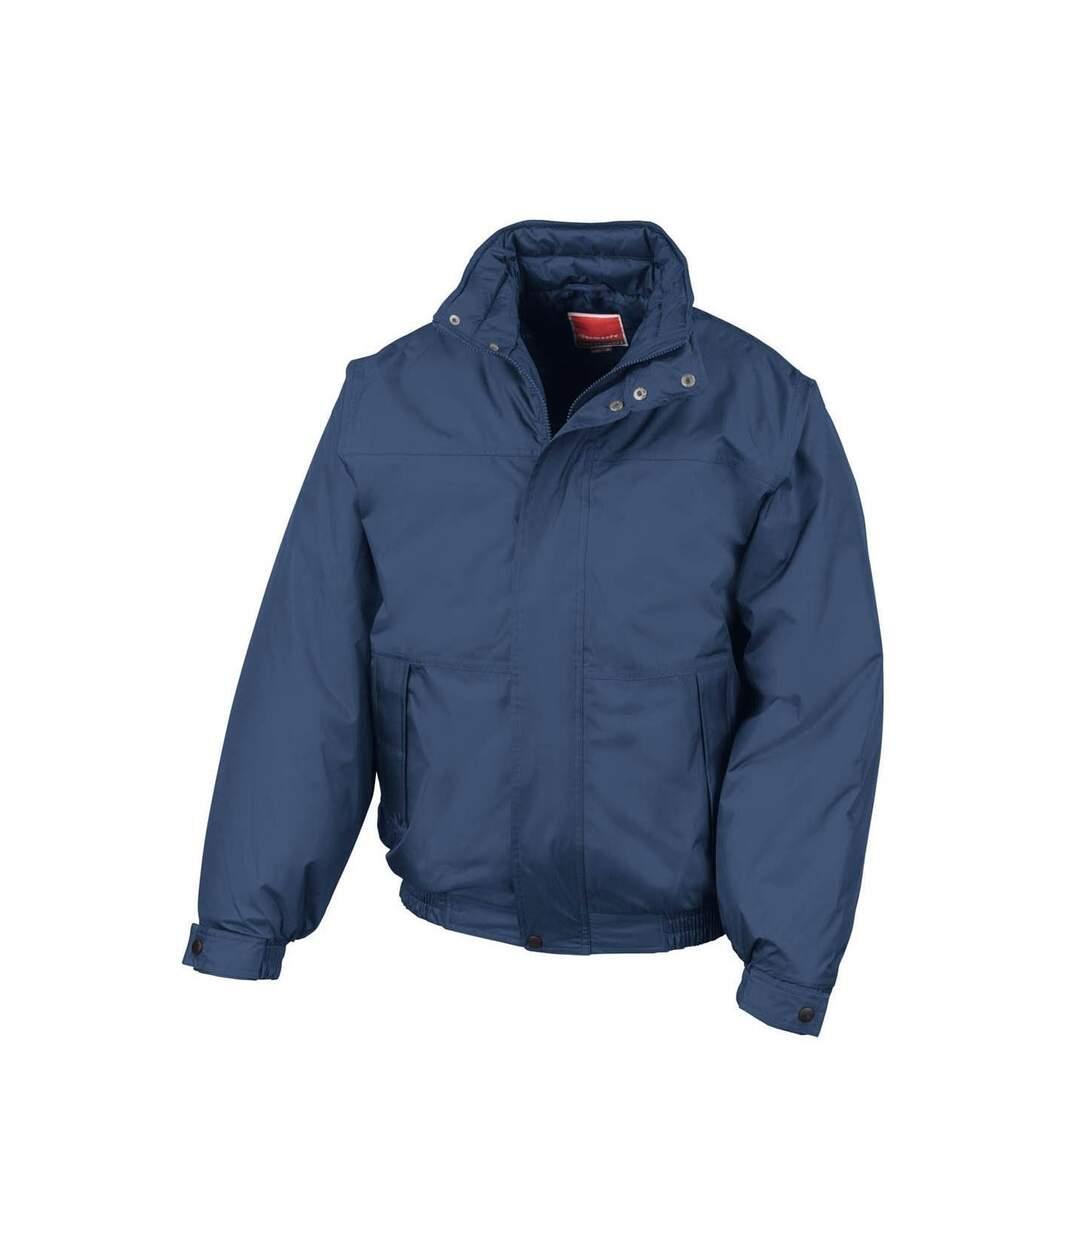 Result Mens Shoreline Mid-Weight Waterproof Windproof Blouson Jackets (Navy Blue) - UTBC846